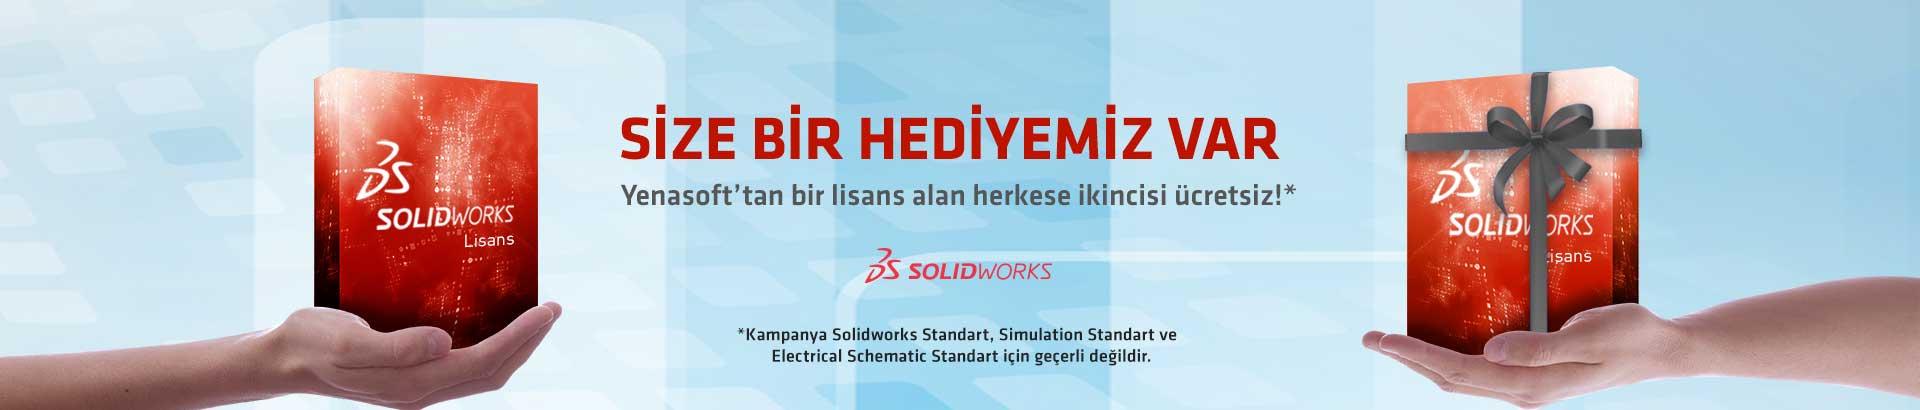 Yenasoft - Solidworks - Hediyemiz Var